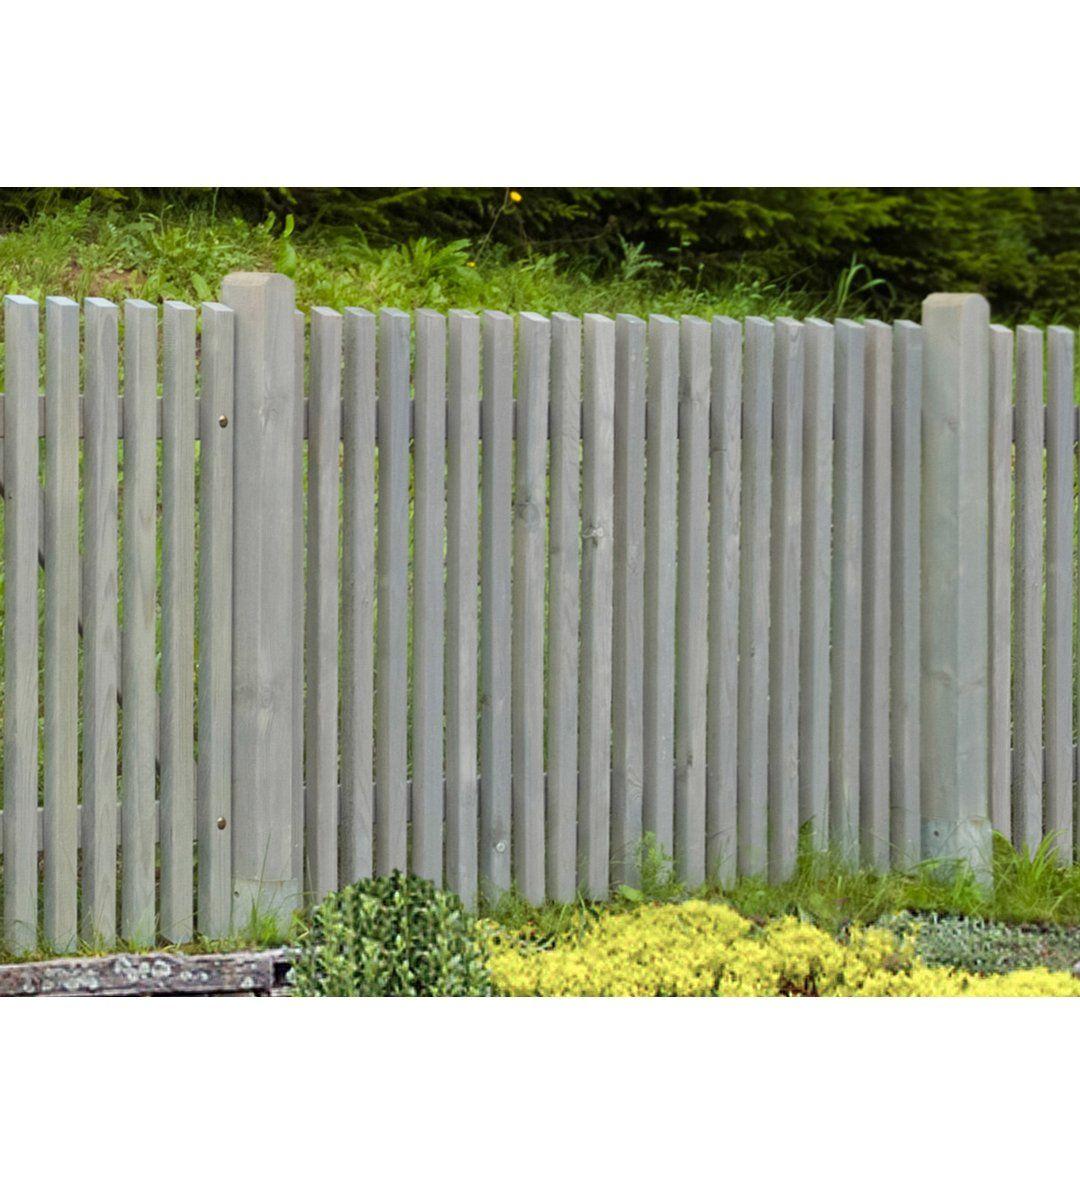 Staketenzaun Mainau Hellgrau Lasiert 180 Cm X 100 Cm Kaufen Bei Obi Zaun Garteneingang Vorgarten